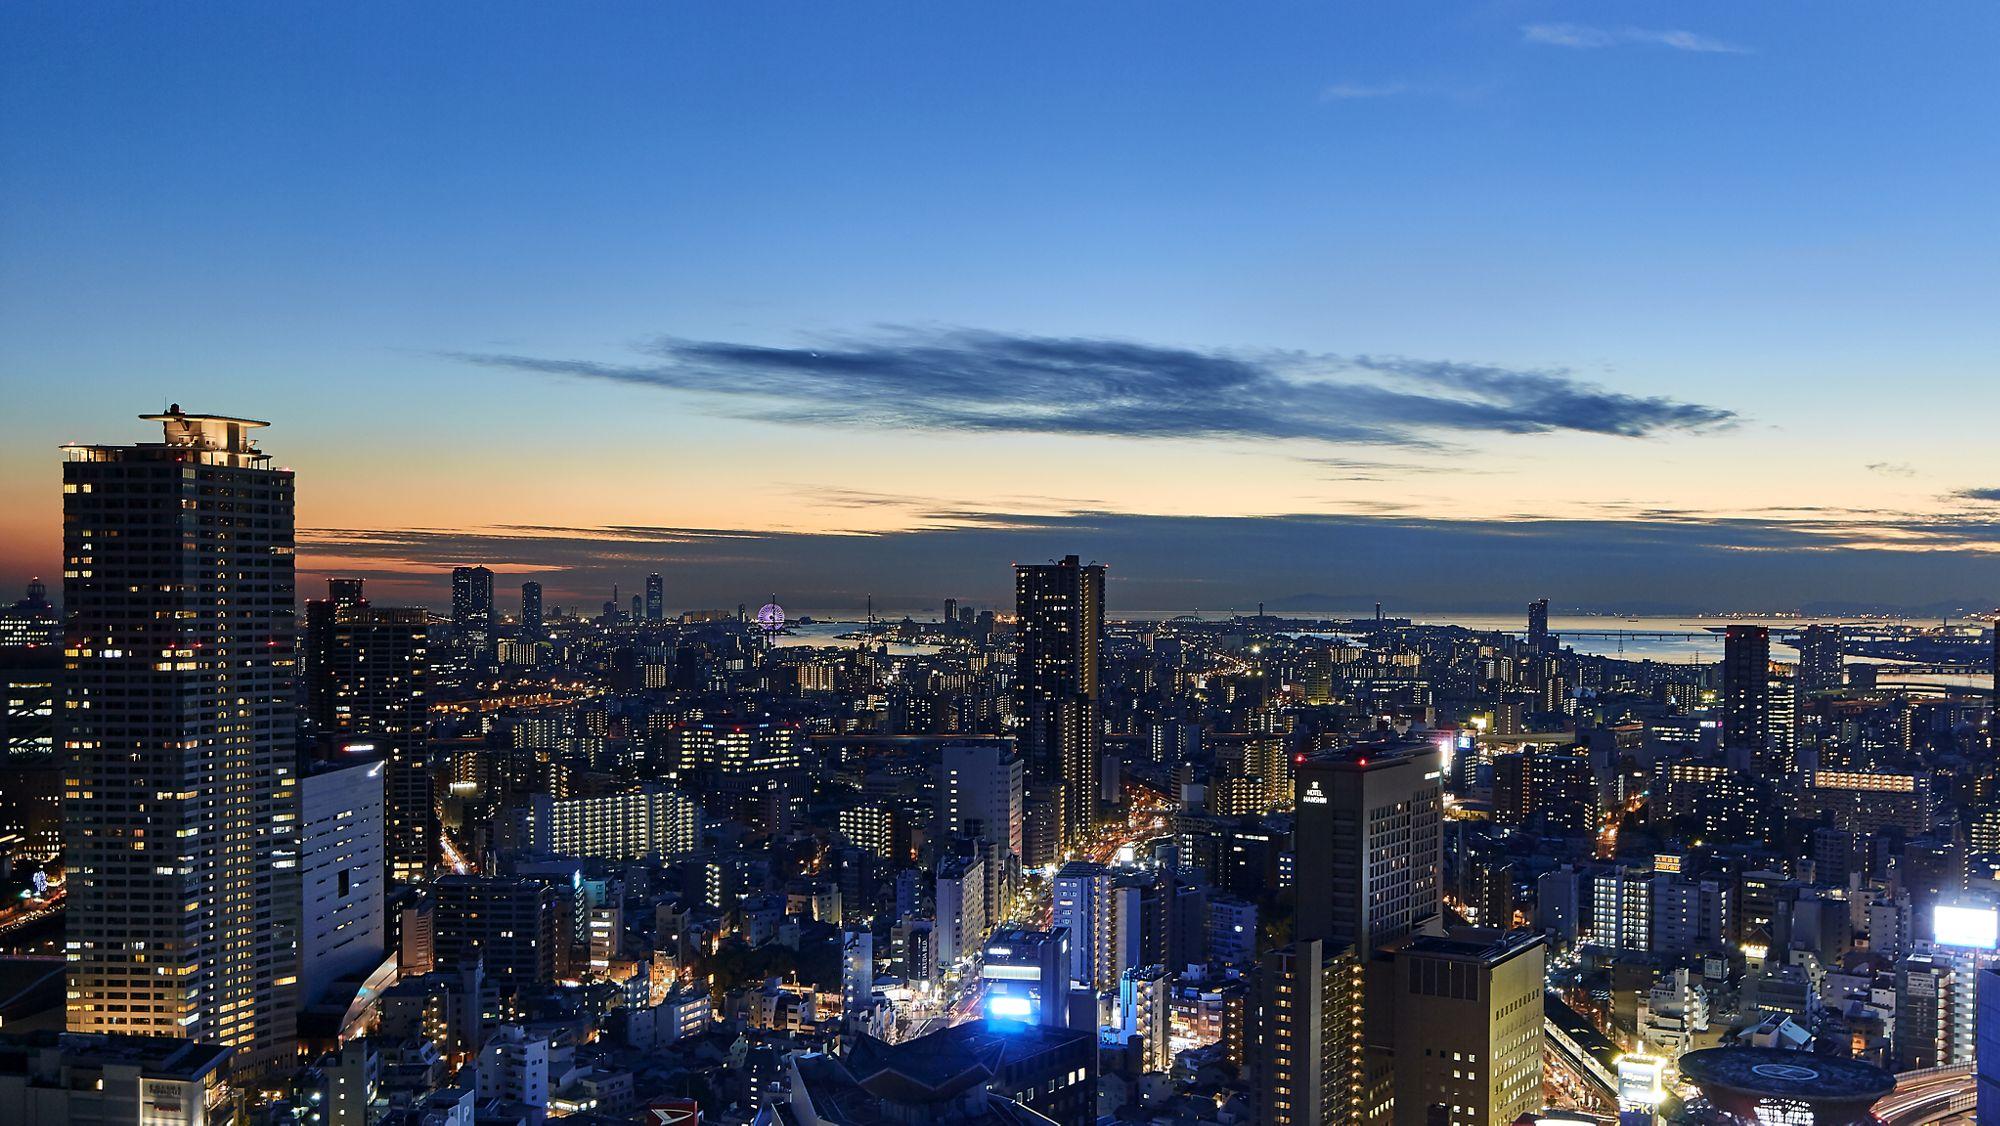 Sunset over the glittering city skyline